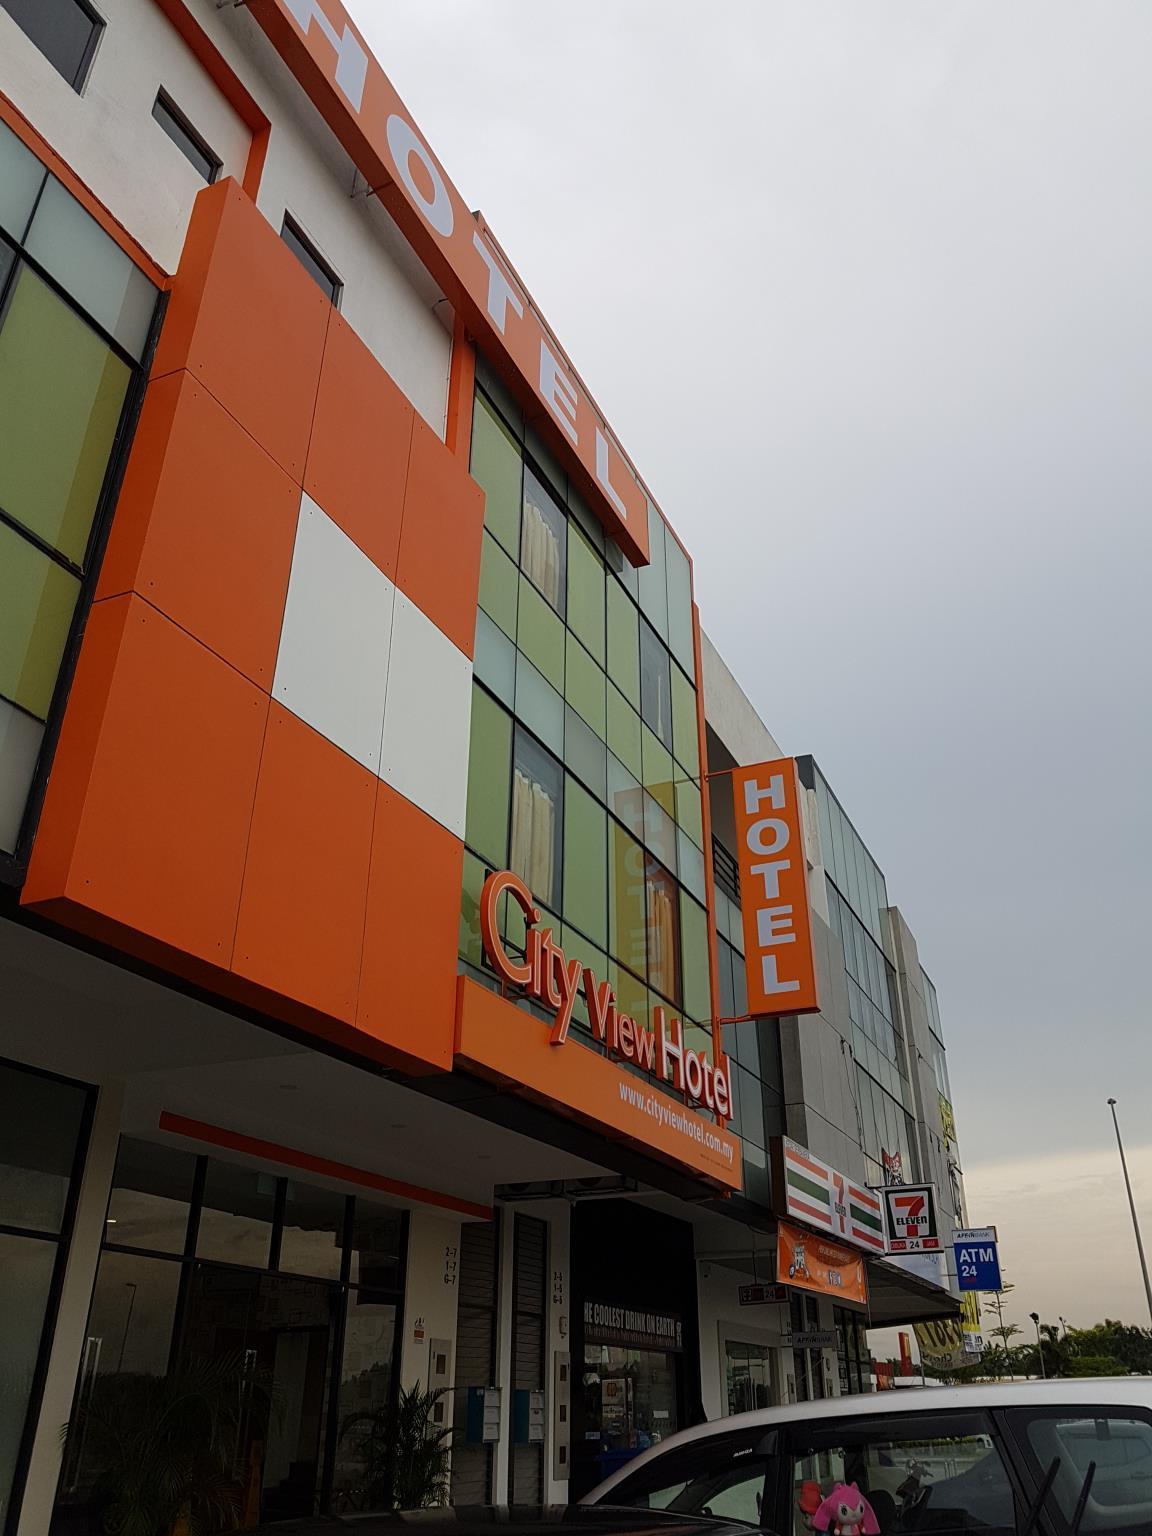 City View Hotel At KLIA & KLIA2, Kuala Lumpur